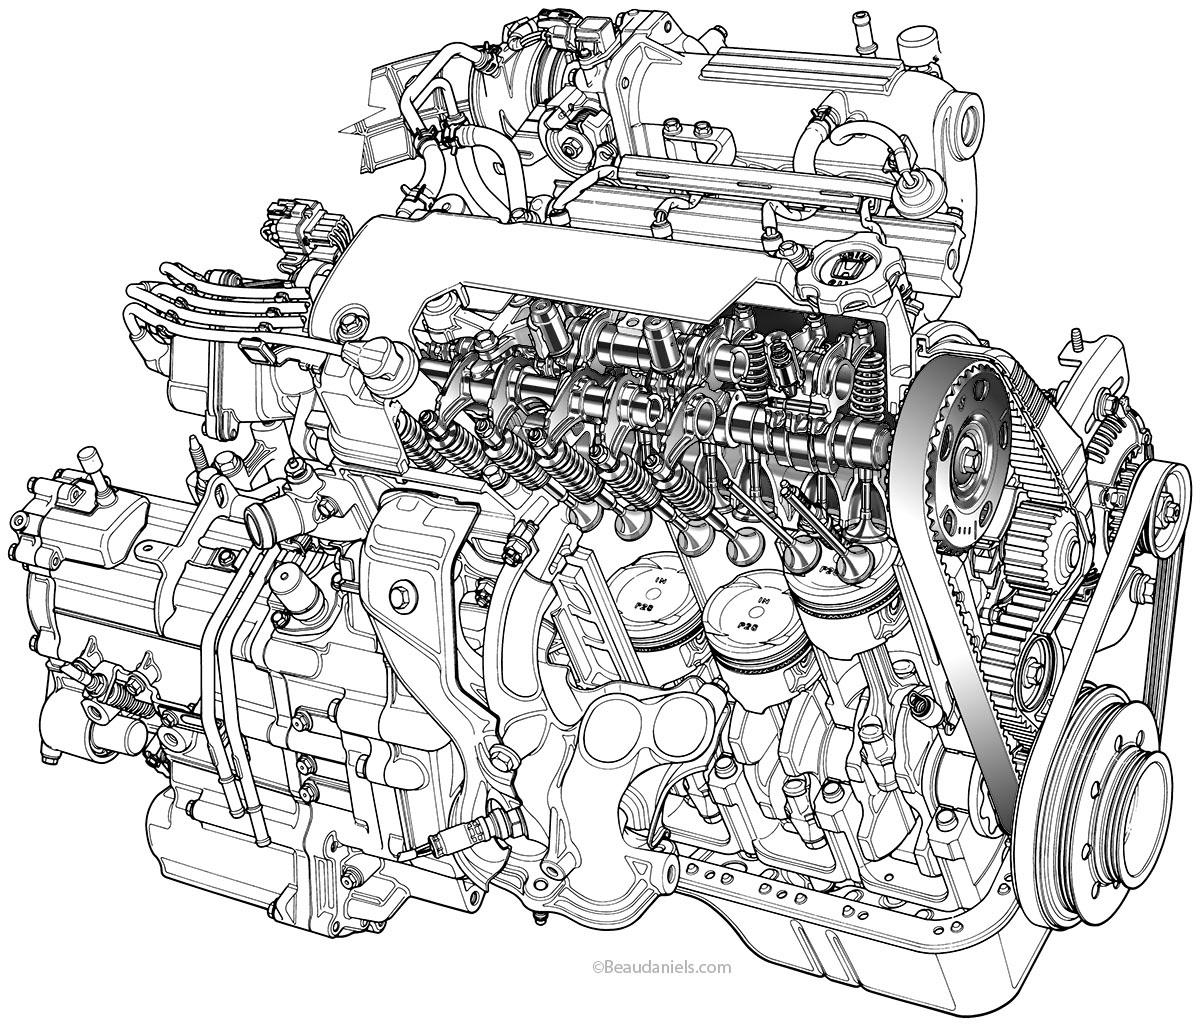 Two Stroke Engine Diagram Car Best Secret Wiring Diesel Four Cylinder Animation Imageresizertool Com Dirt Bike 2